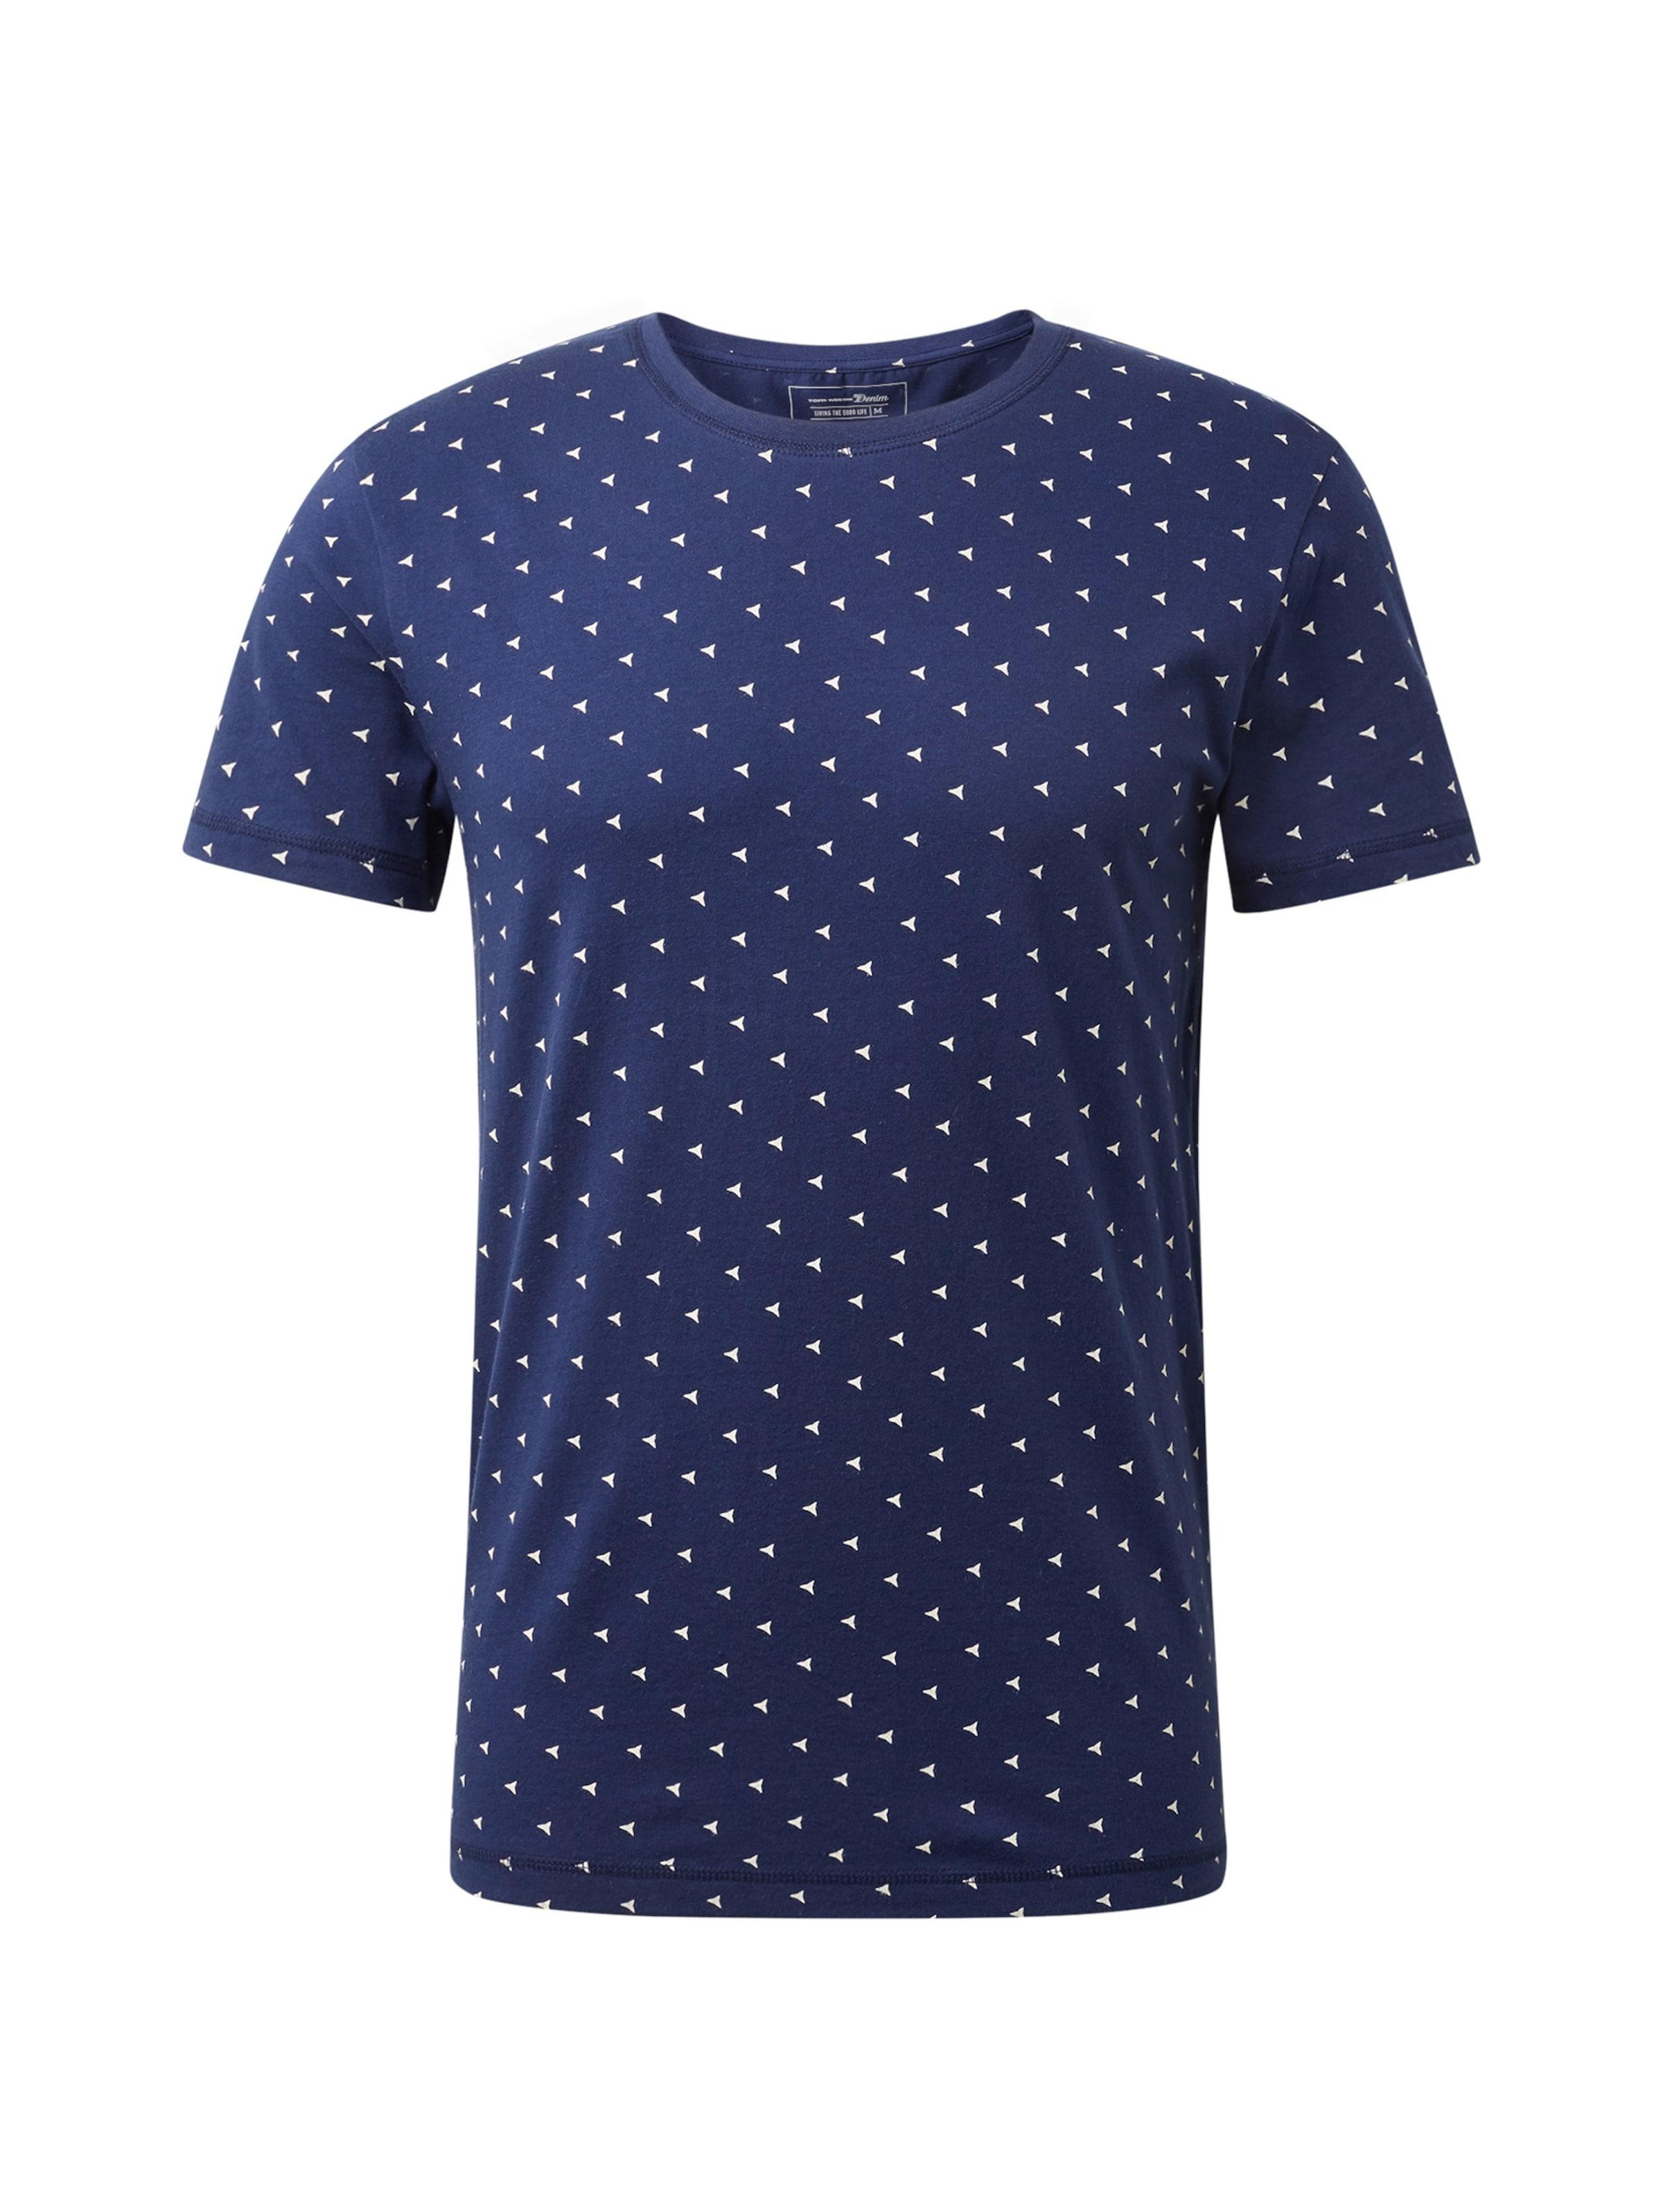 In Tailor T Denim Tom shirt Navy cjL4A3Rq5